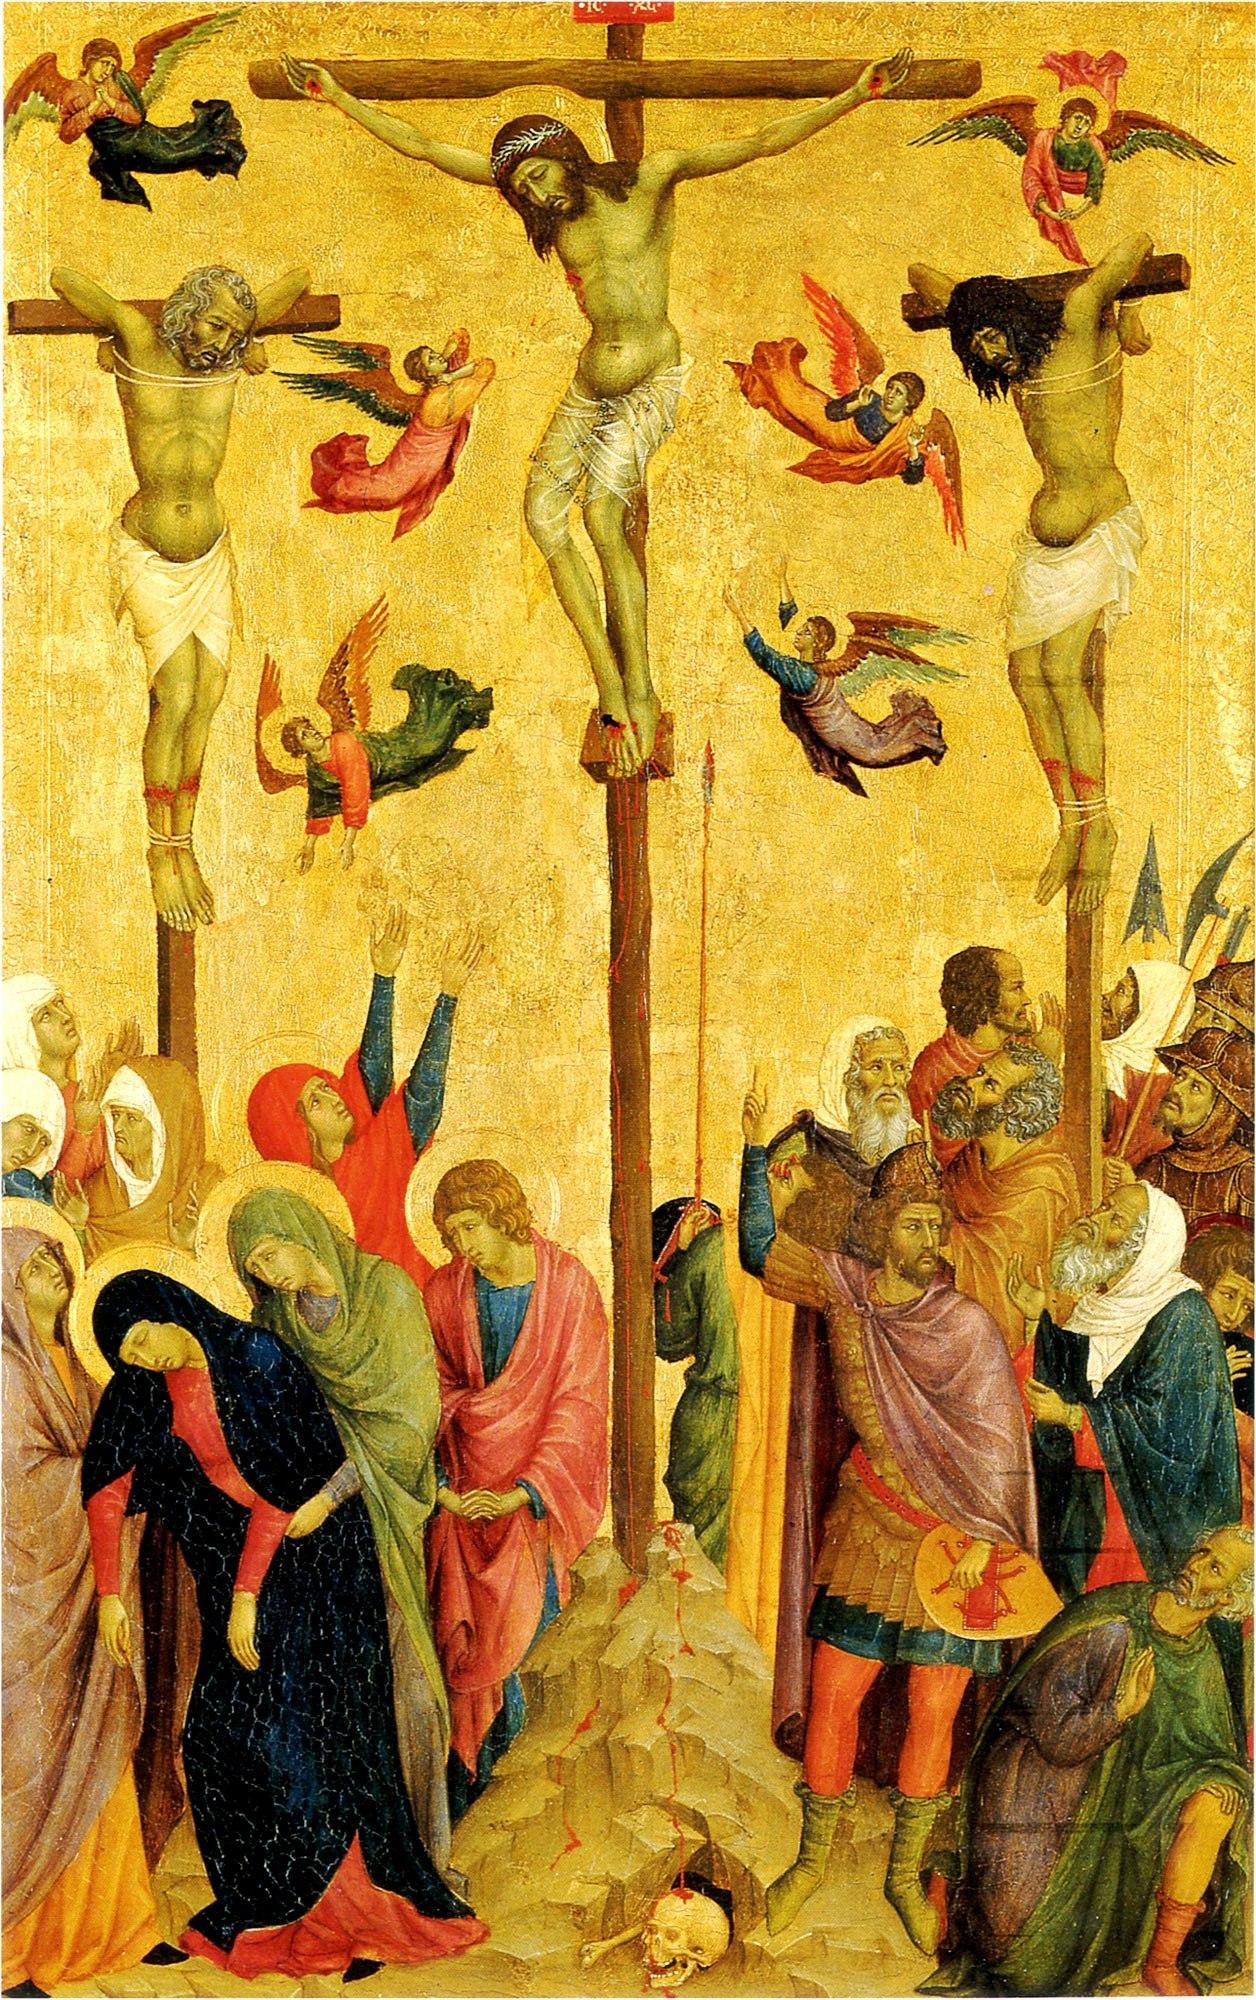 The-Crucifixion- Crawford et Balcarres, master of citta di castello vers 1320 Manchester, City Art Gallery